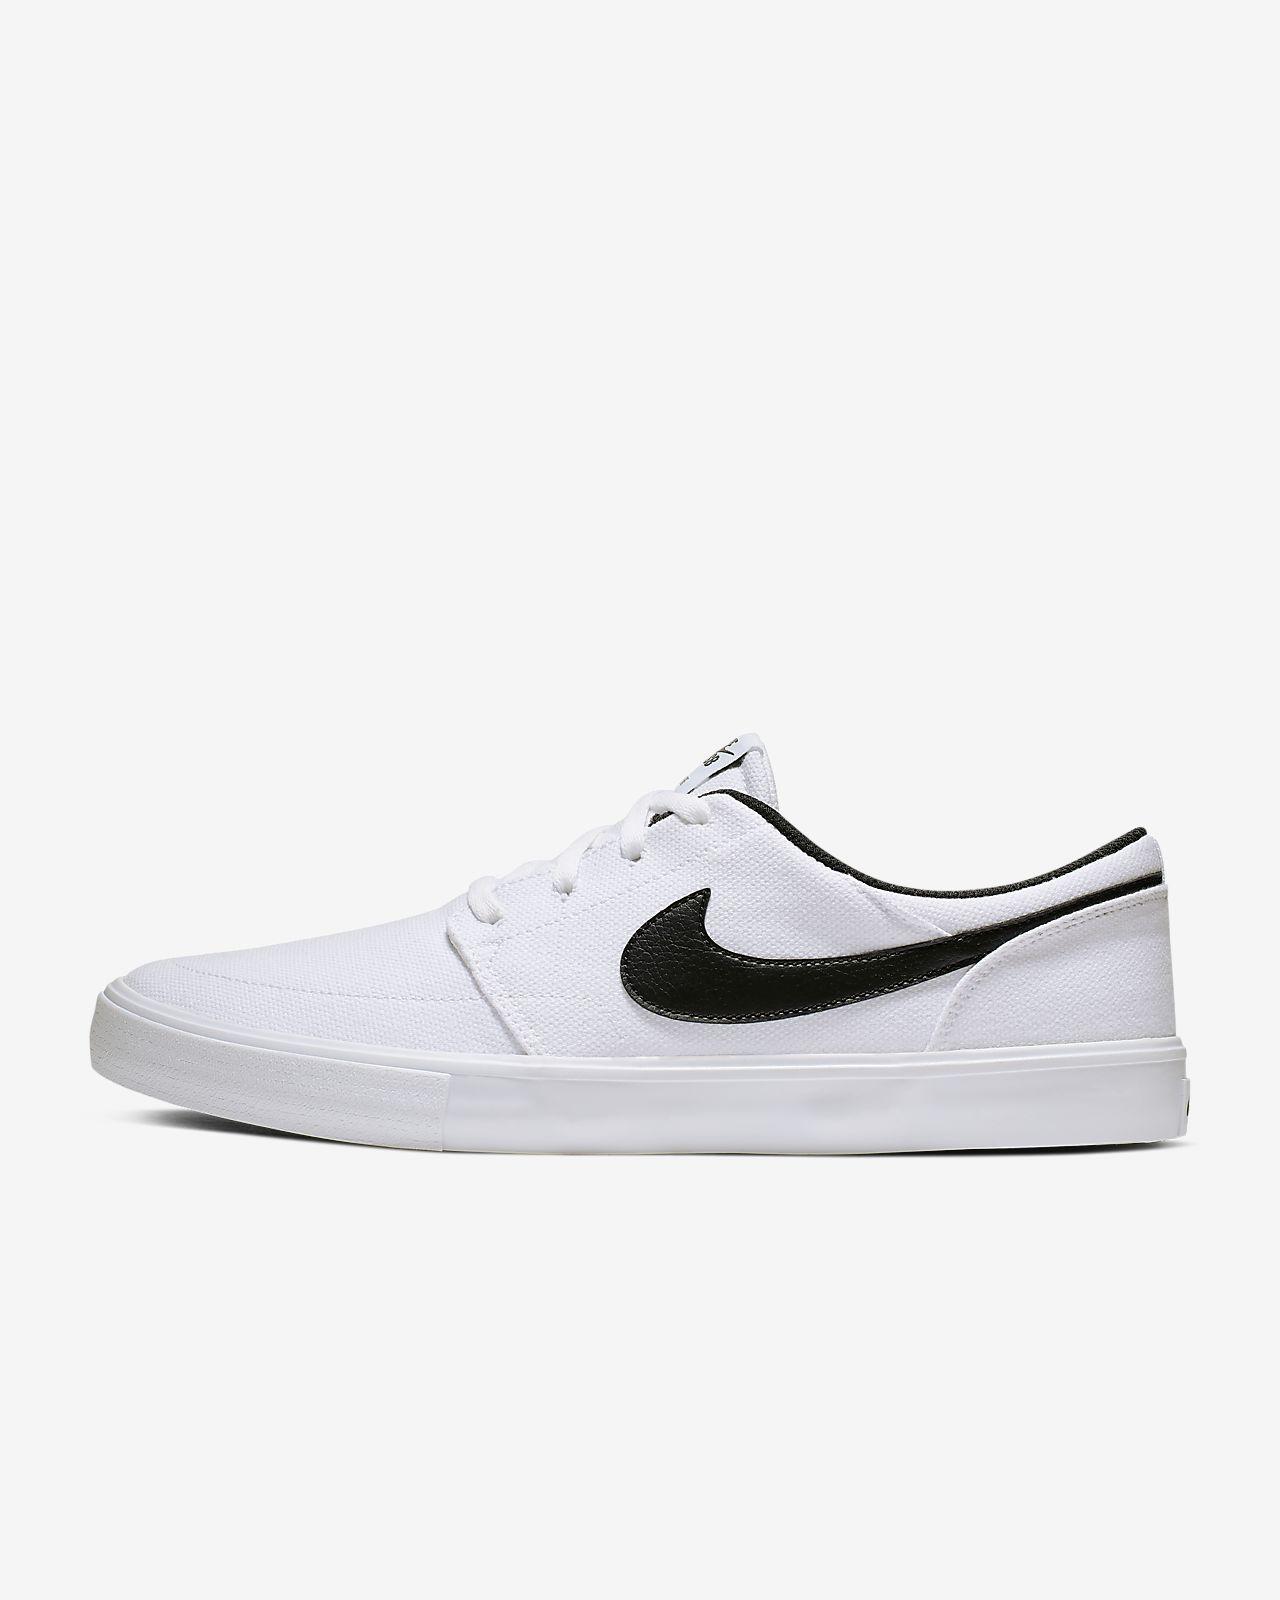 Nike SB Solarsoft Portmore 2 Zapatillas de skateboard